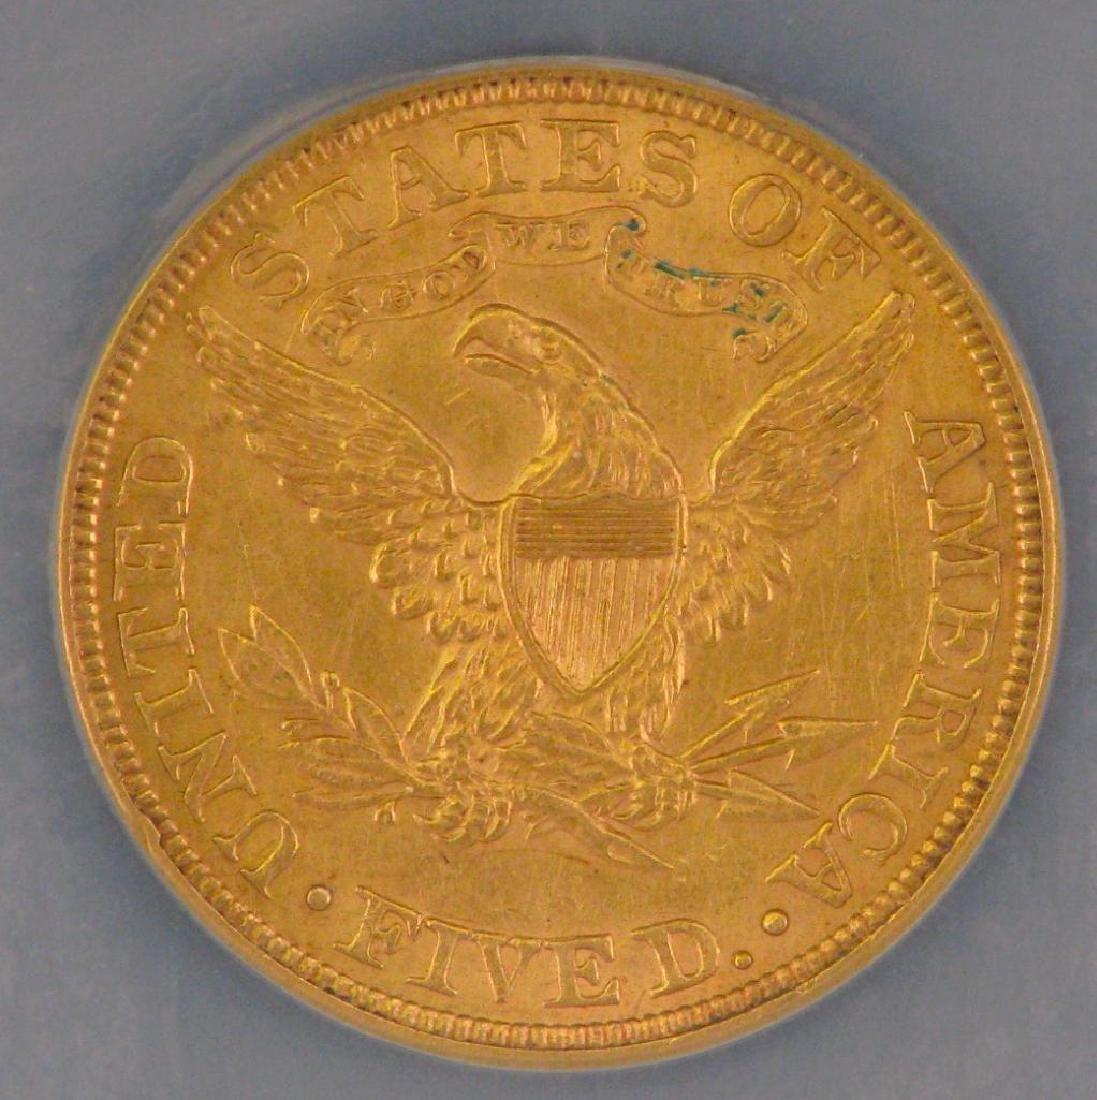 1900 Liberty Head $5 Gold Piece - 4